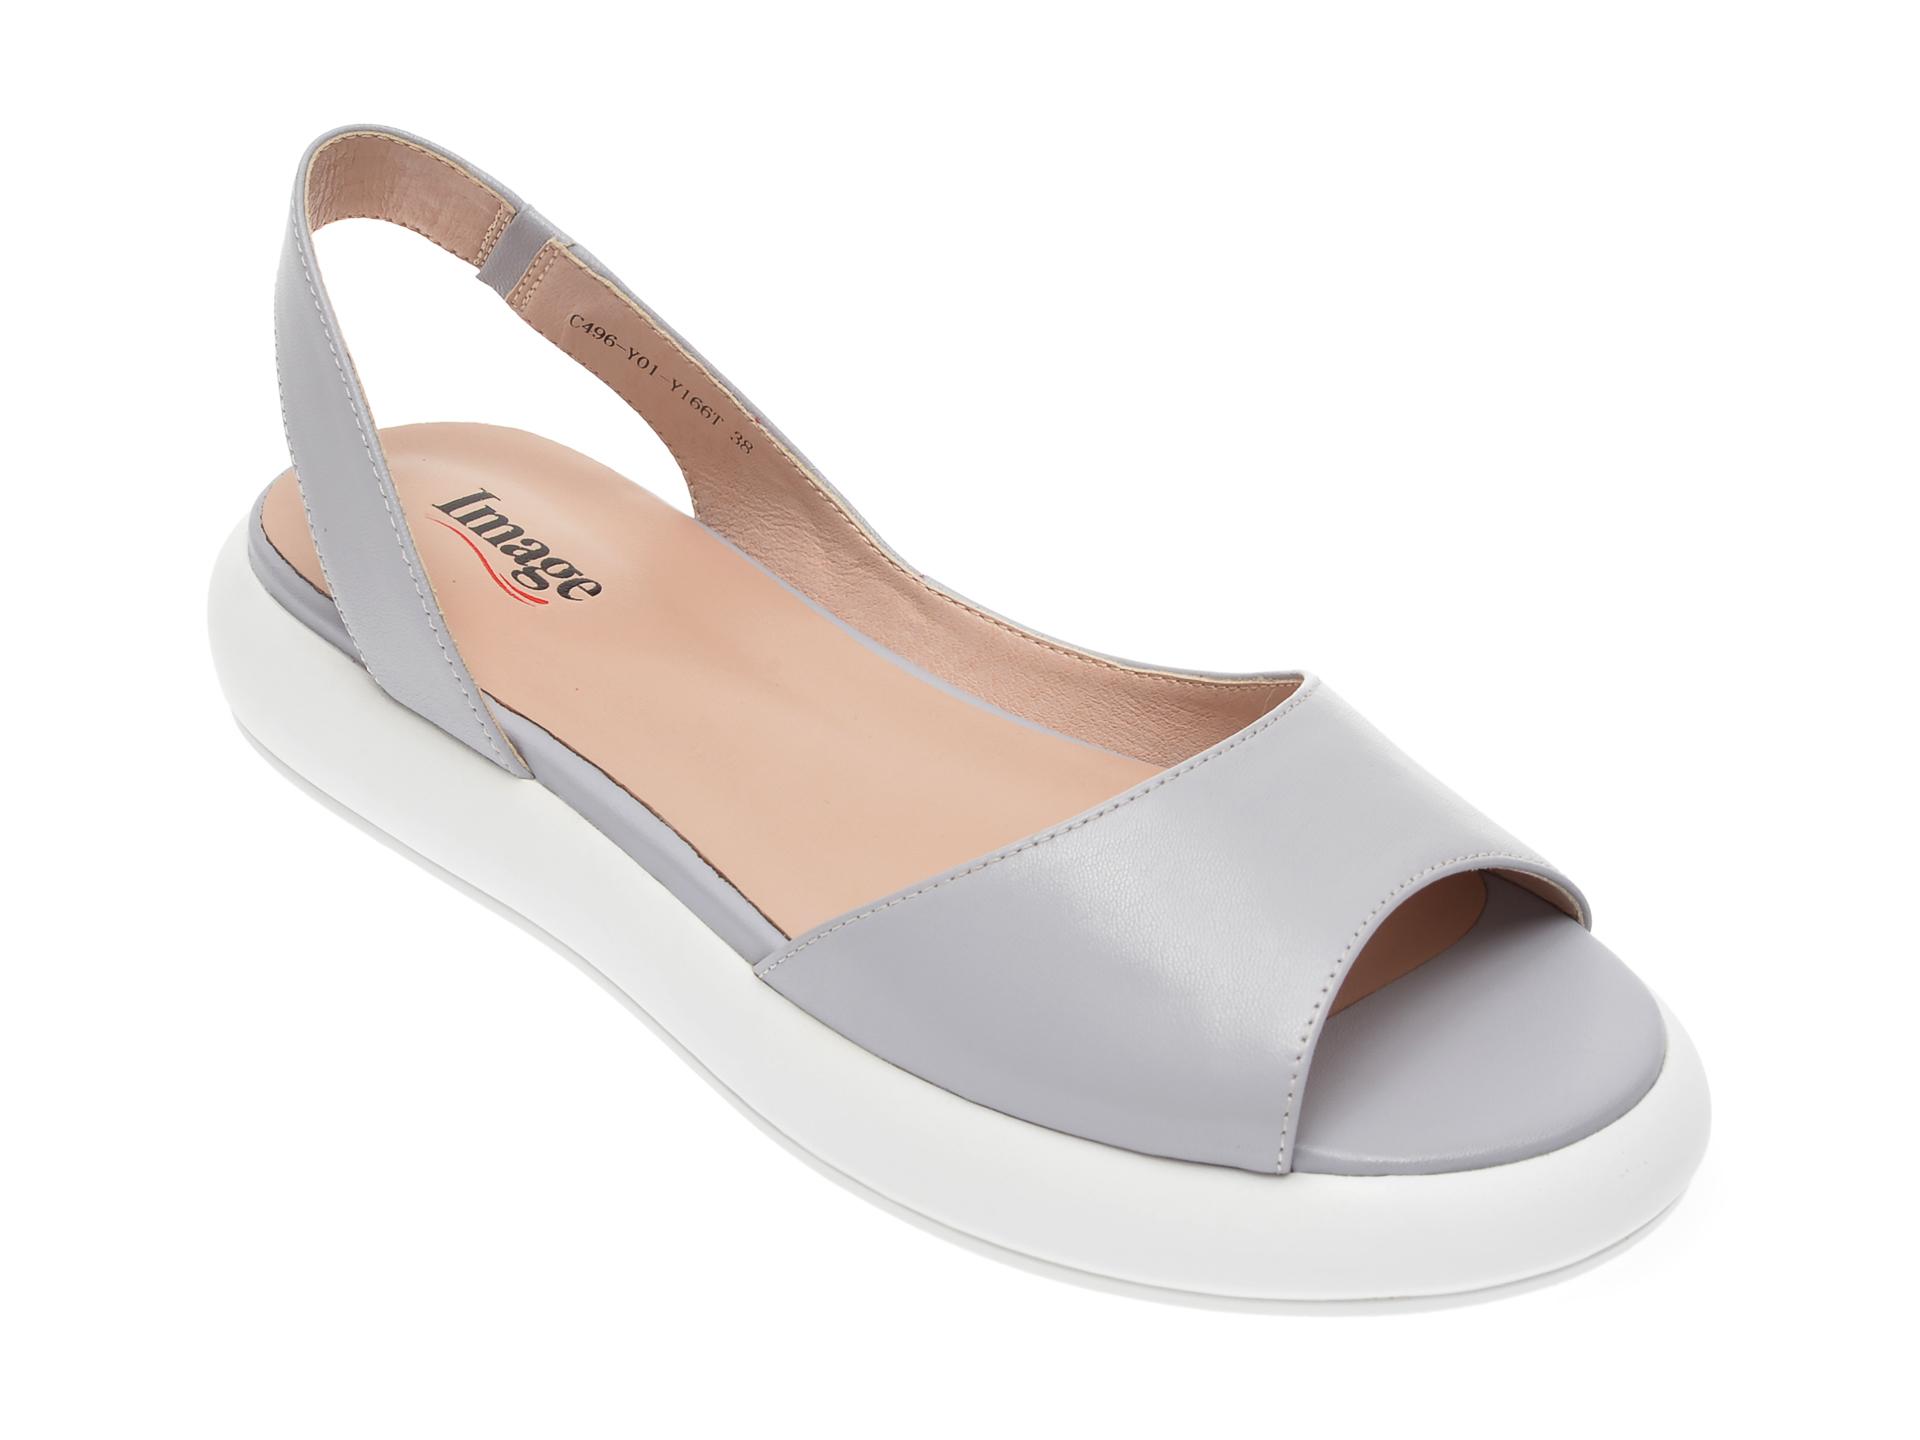 Sandale IMAGE gri, C496Y01, din piele naturala imagine